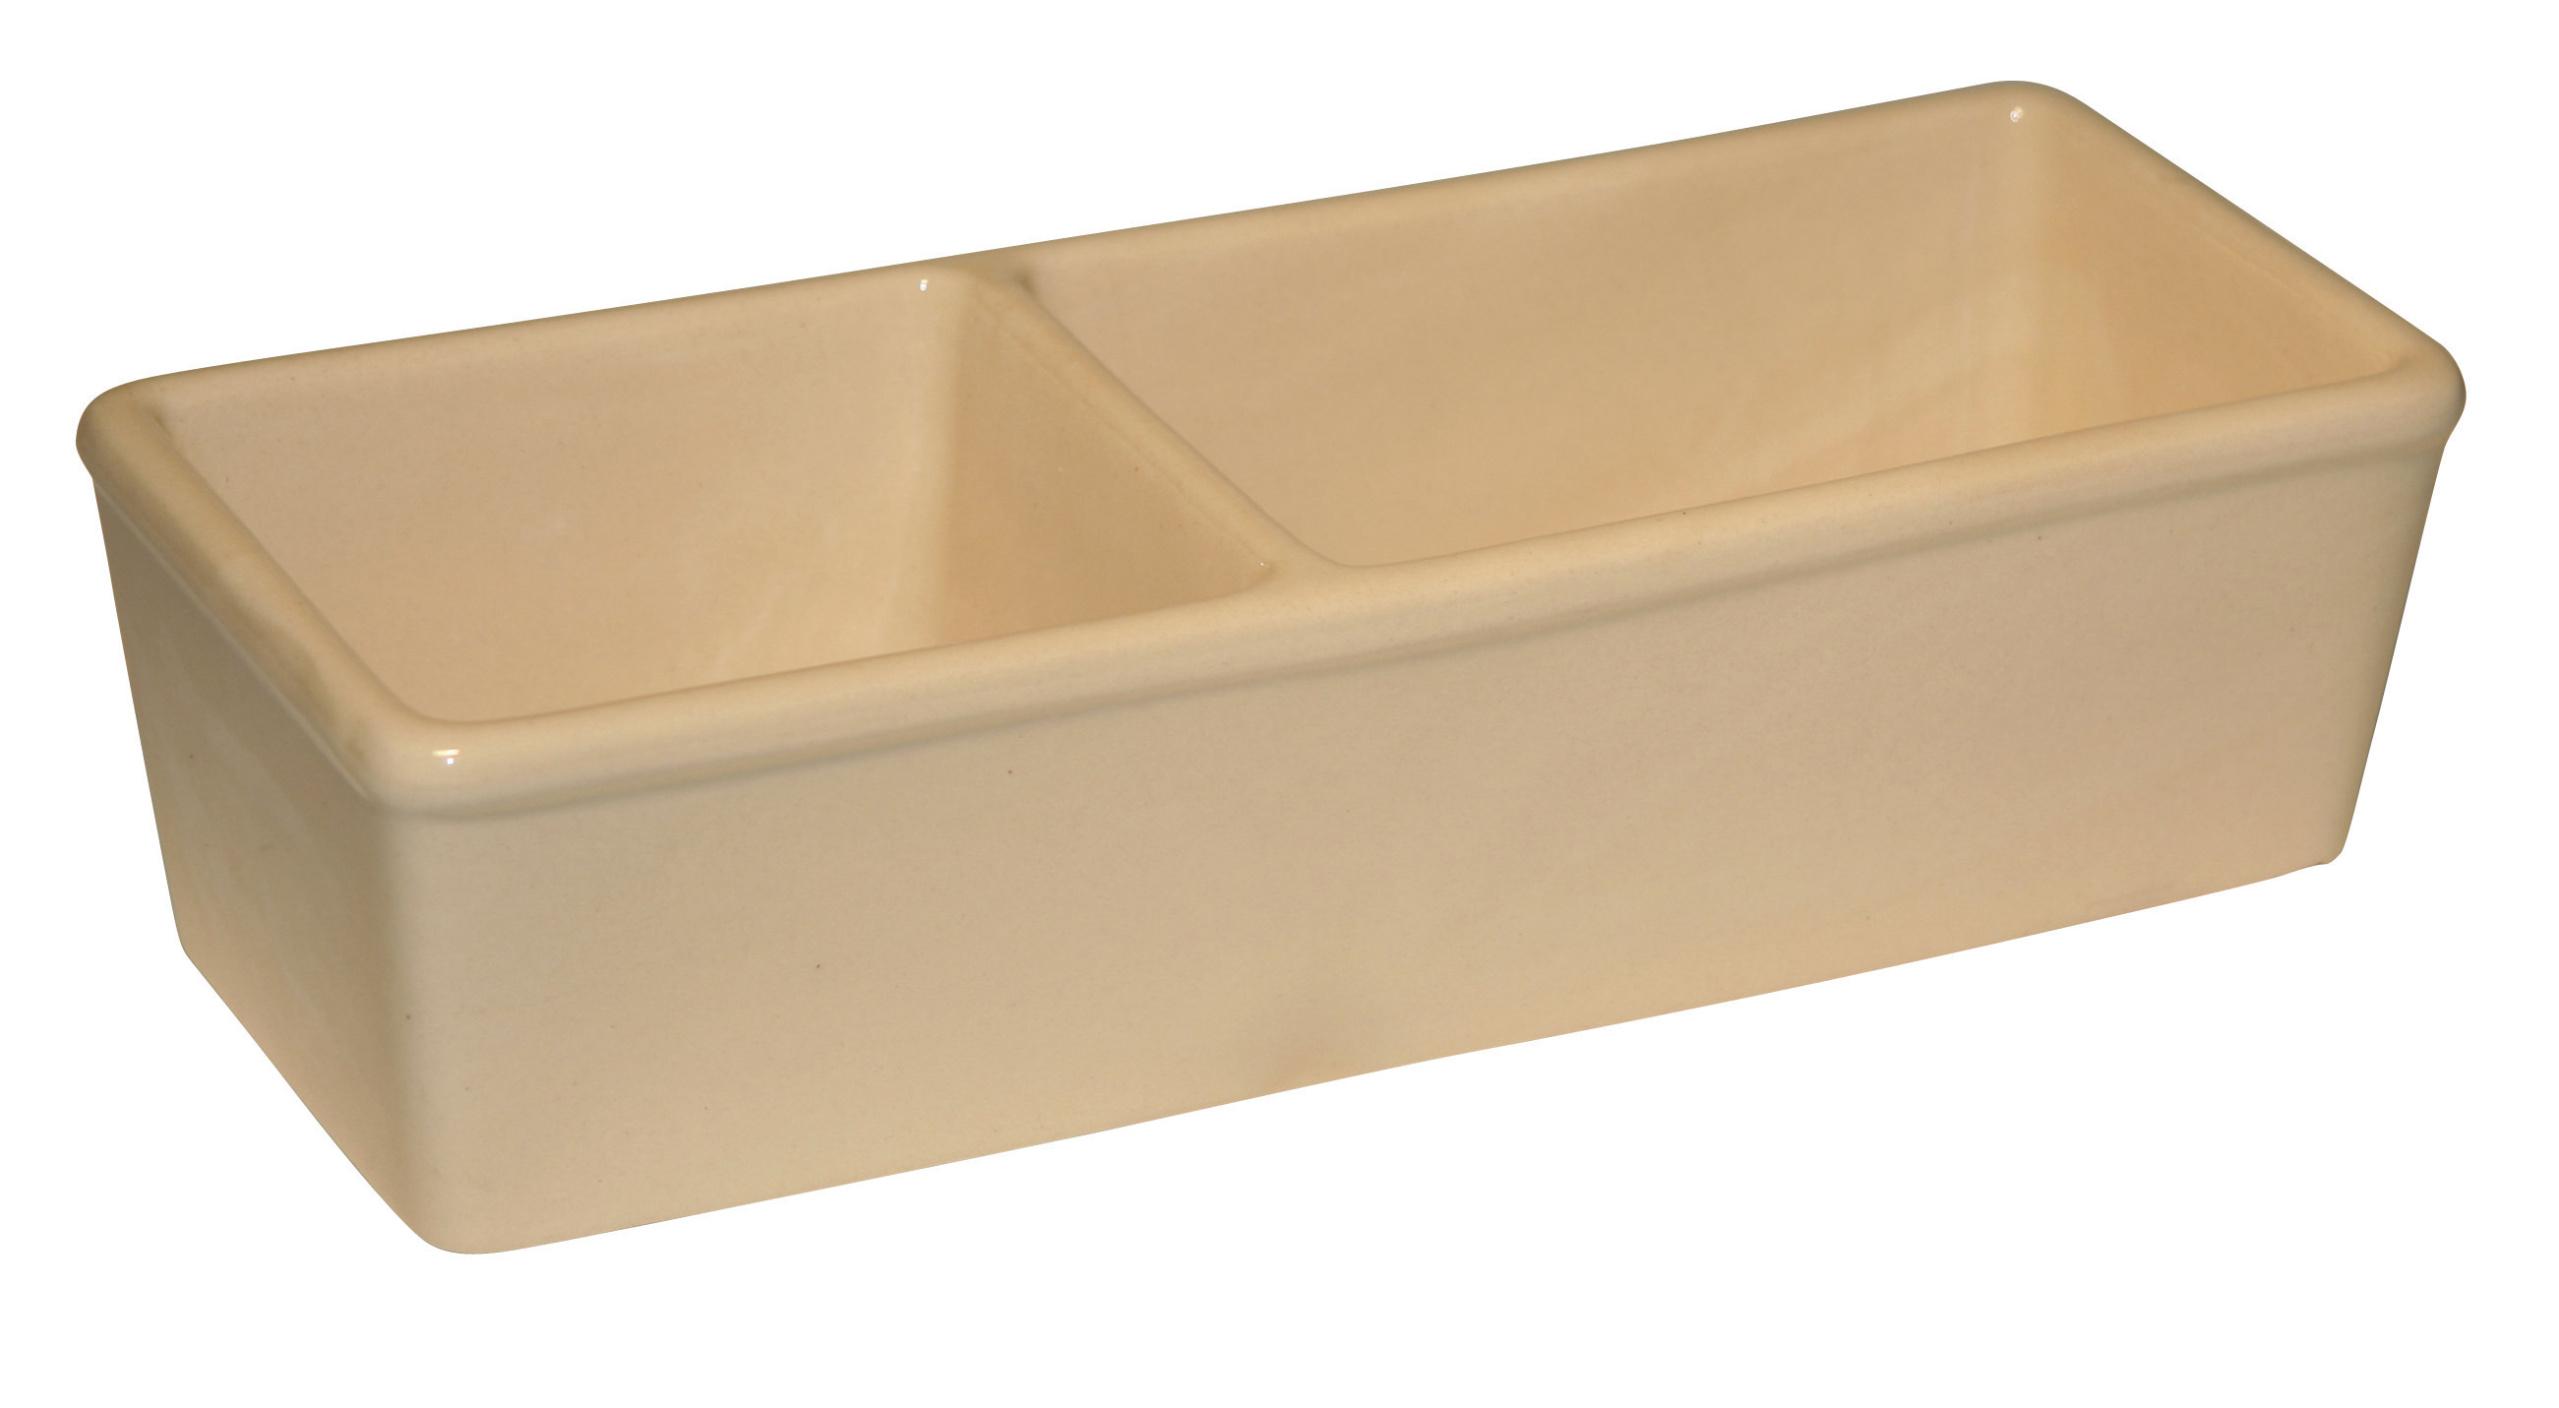 Keramiknapf für Nager, doppelt 350ml + 450ml